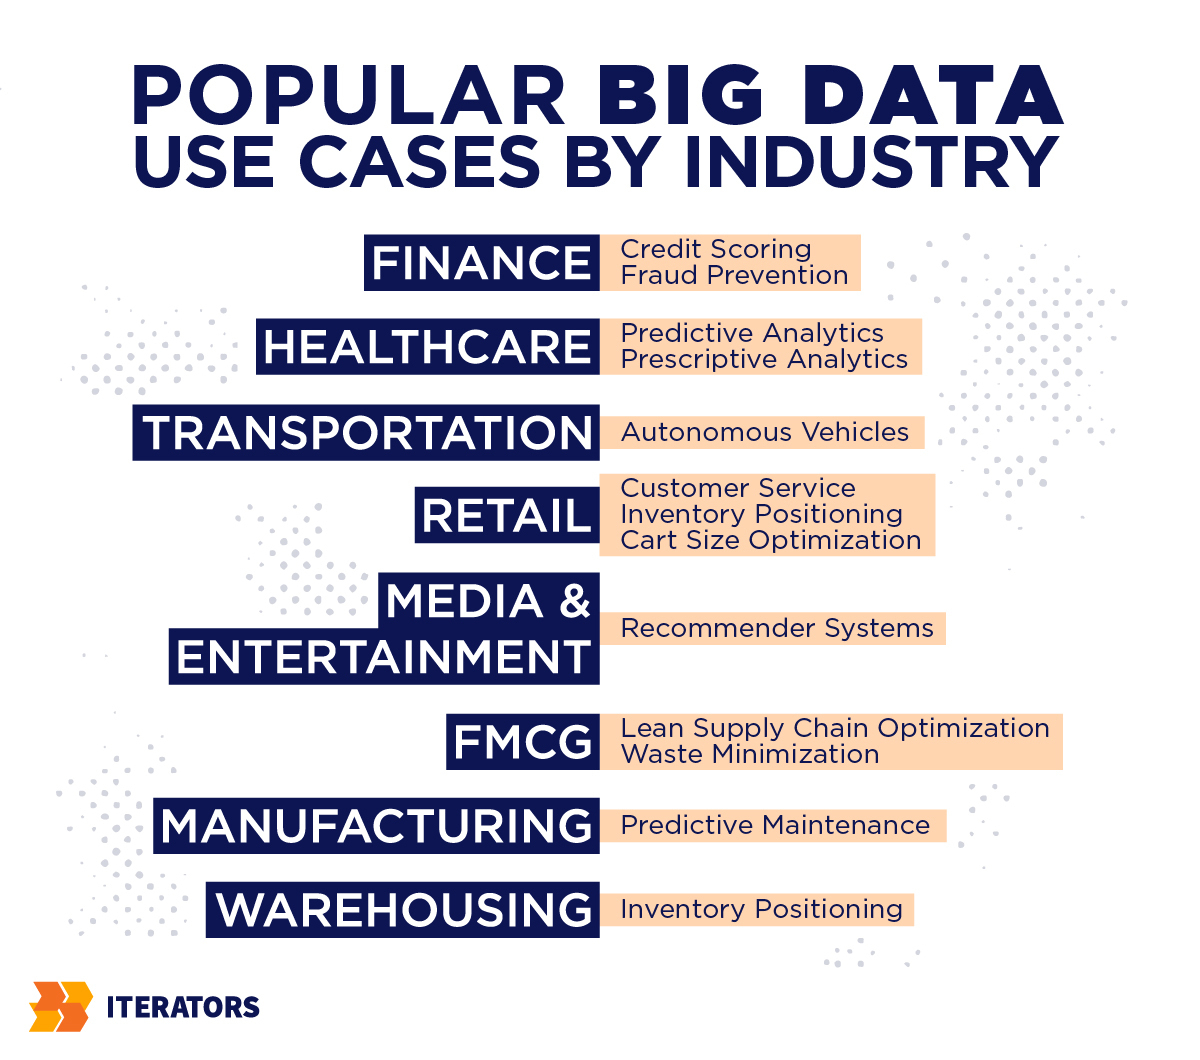 big data use cases